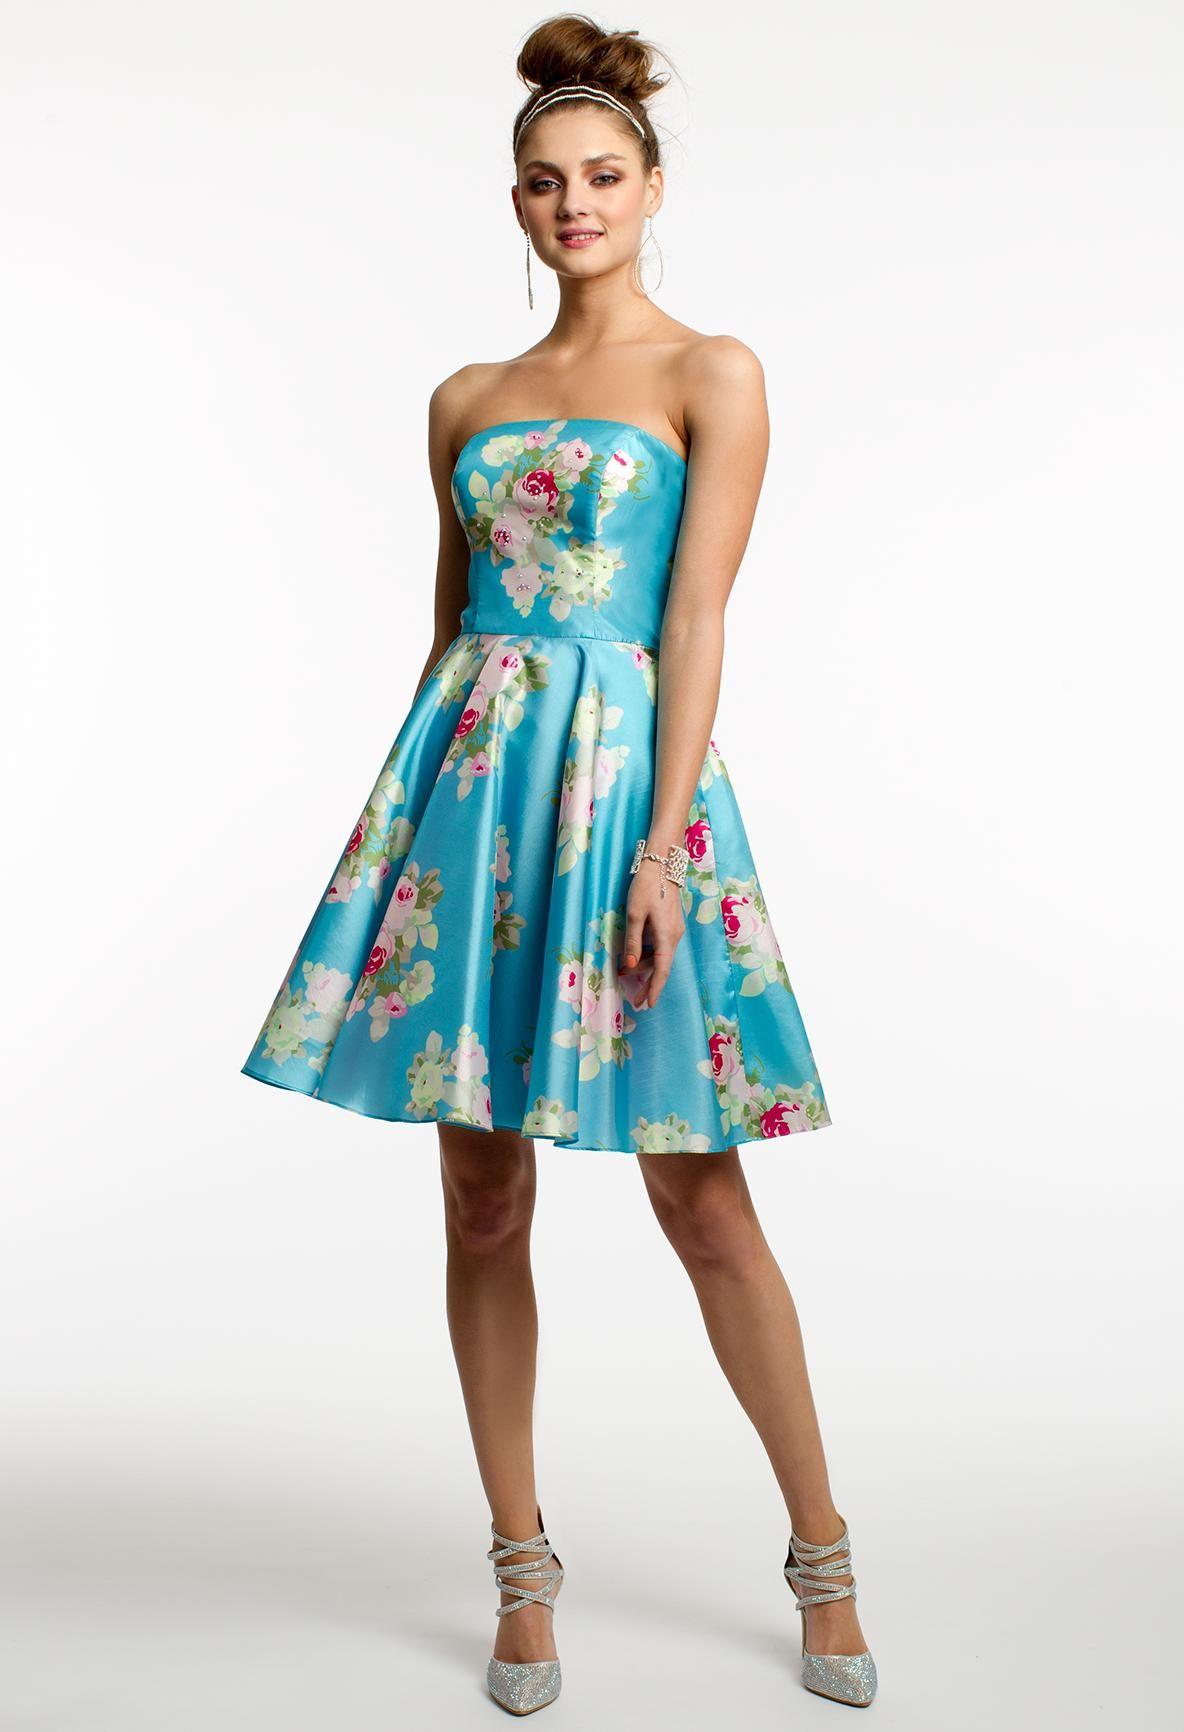 Floral Print Short Party Dress #camillelavie #CLVprom | PROM DRESSES ...